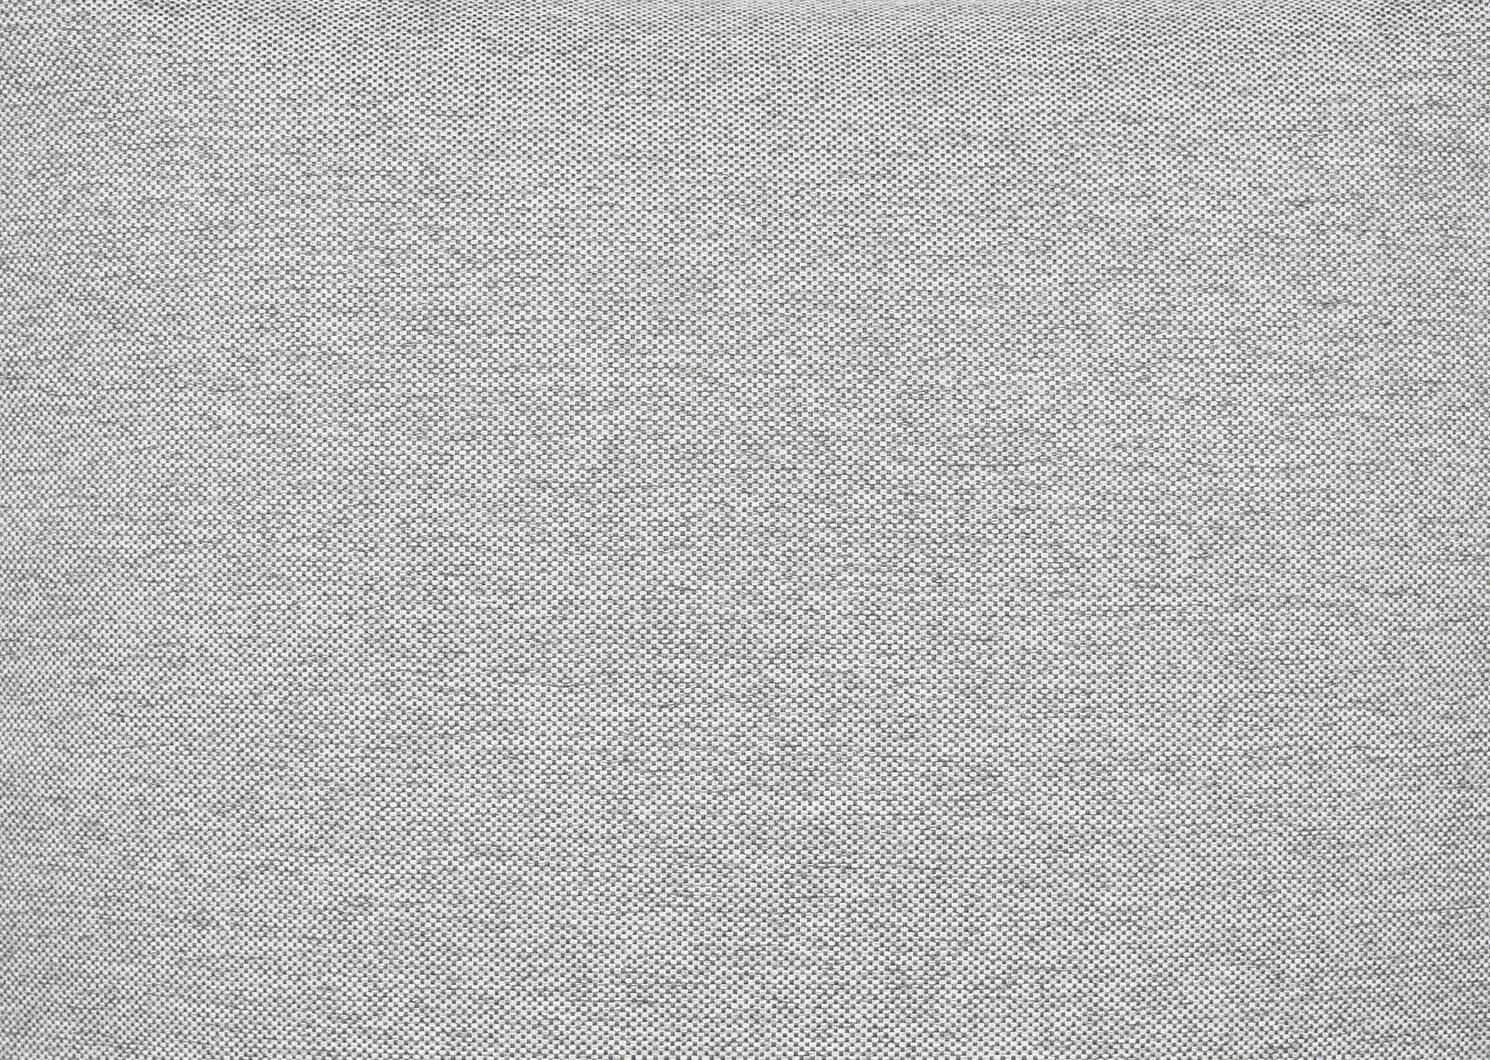 Fauteuil Torrance -Kobe gris